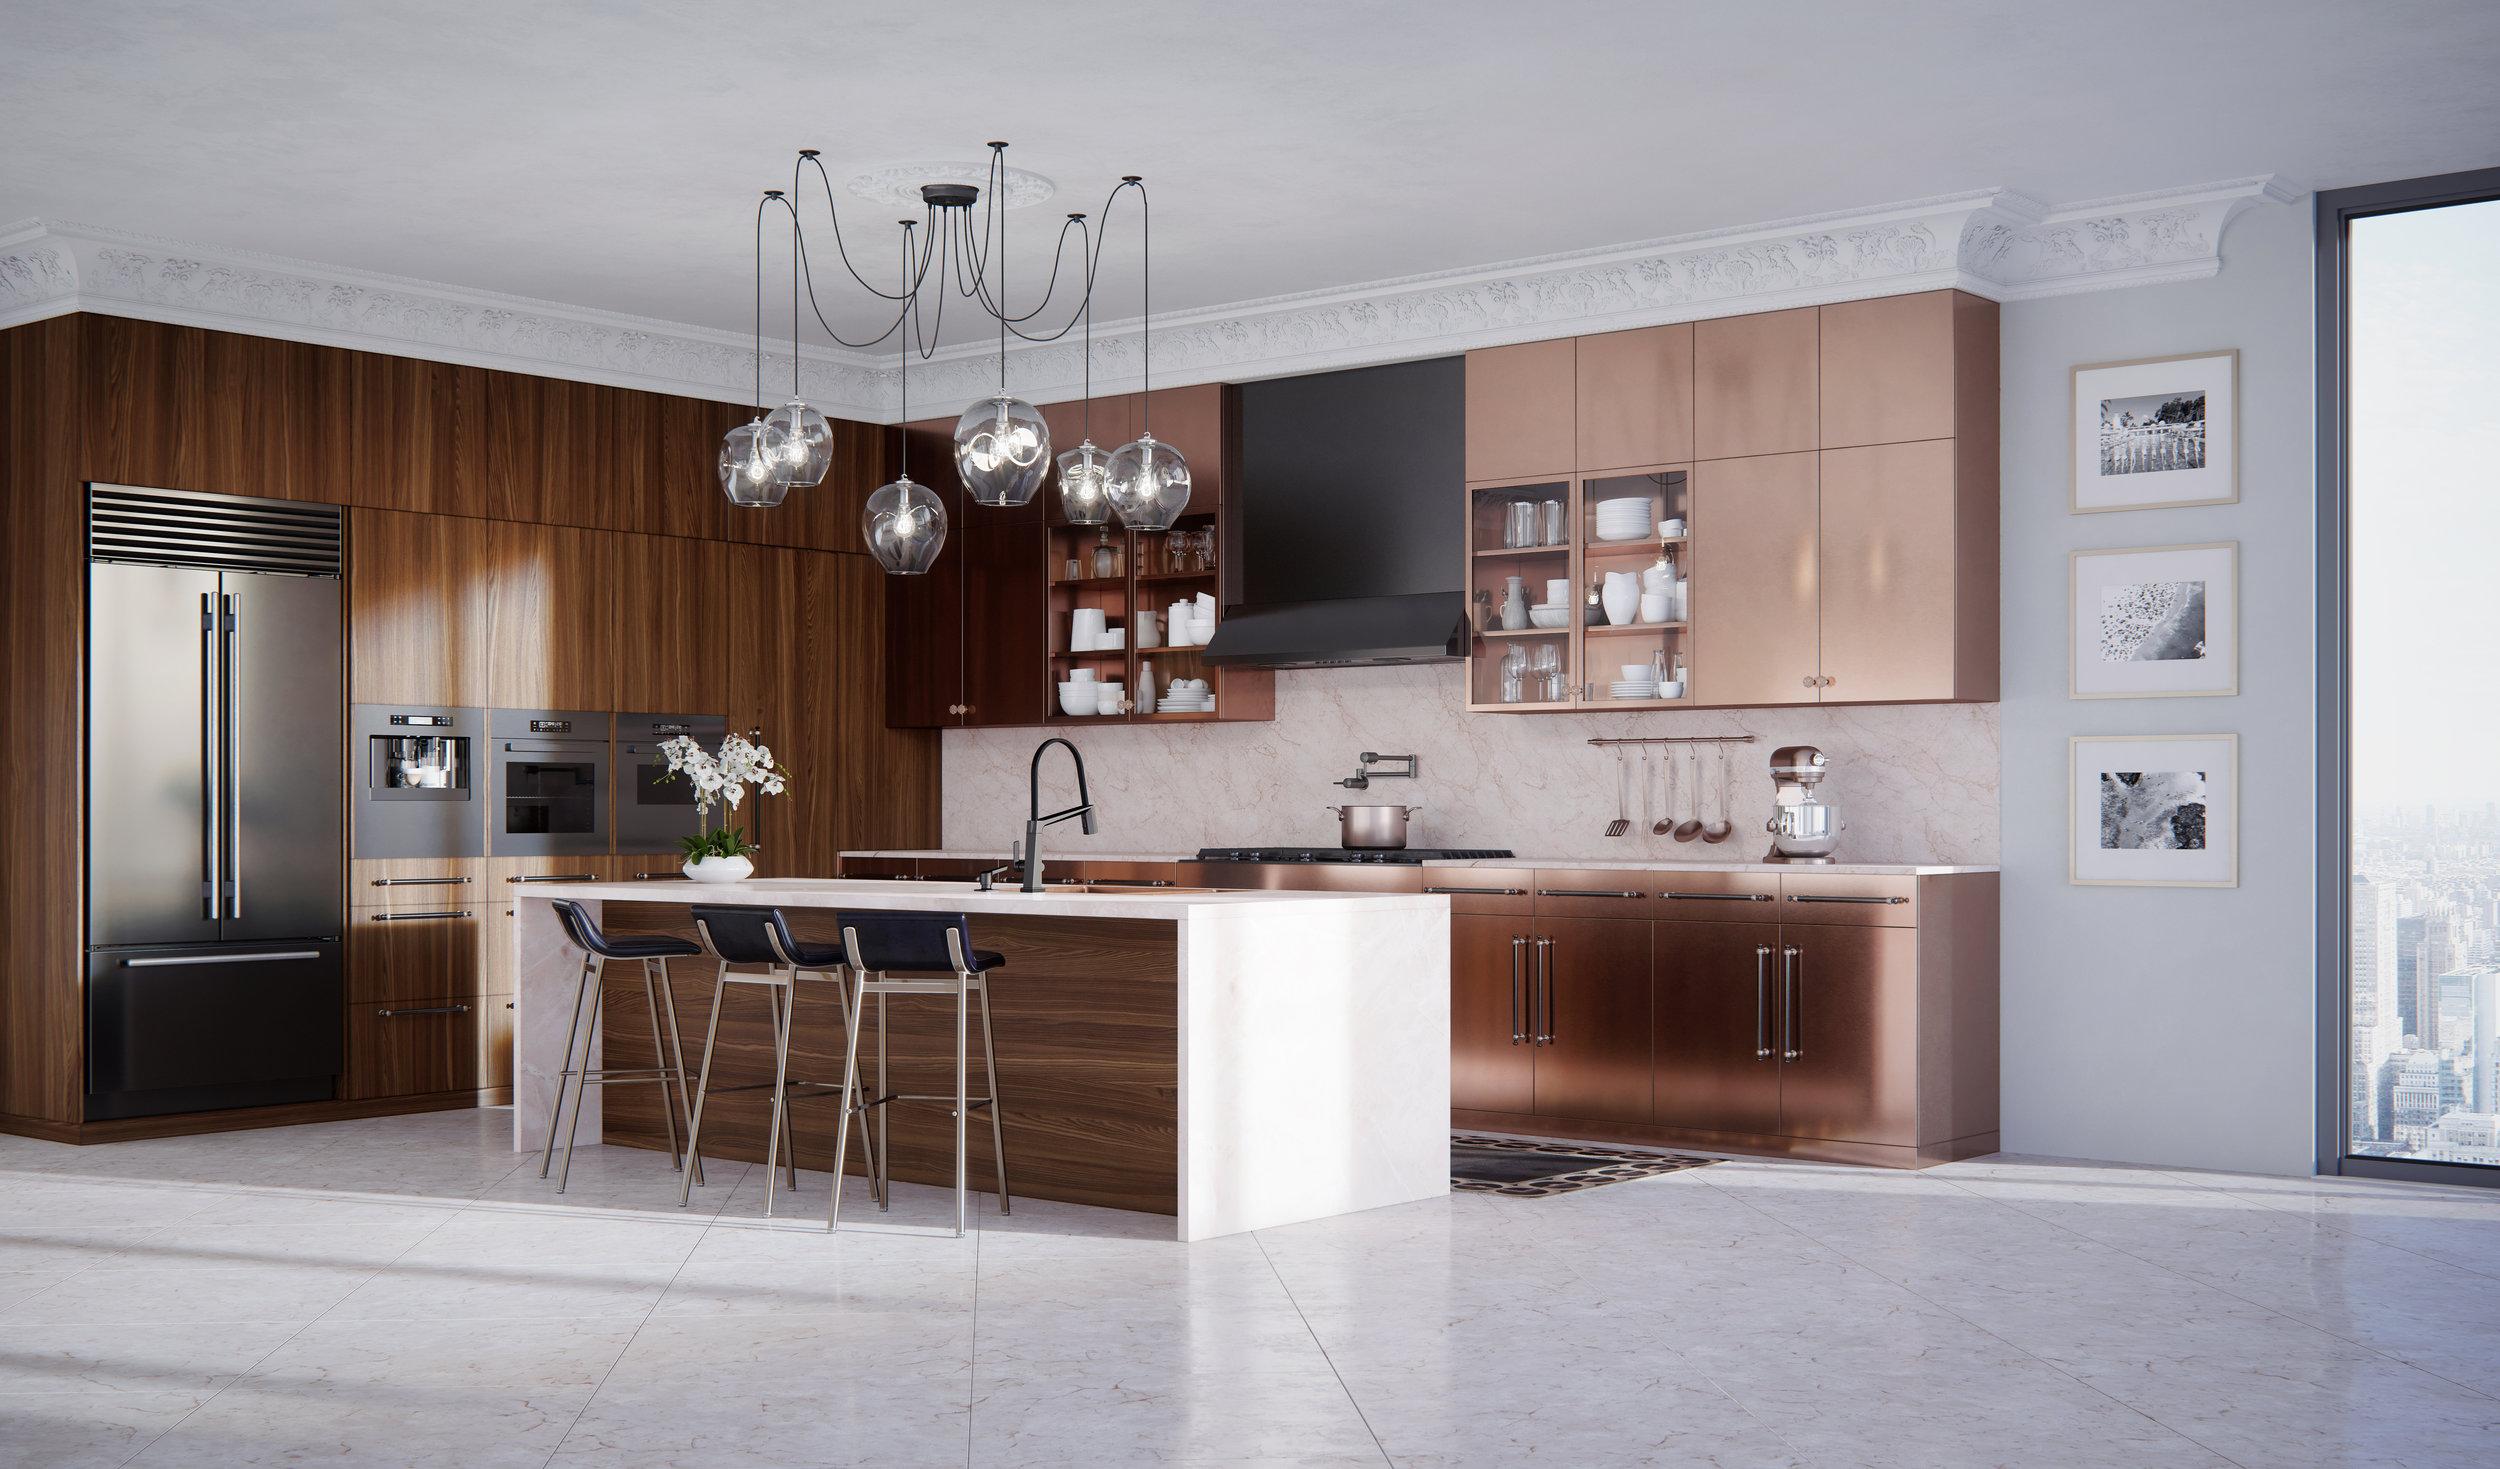 Delta Faucets Pivotal Kitchen_finish_R1.jpg